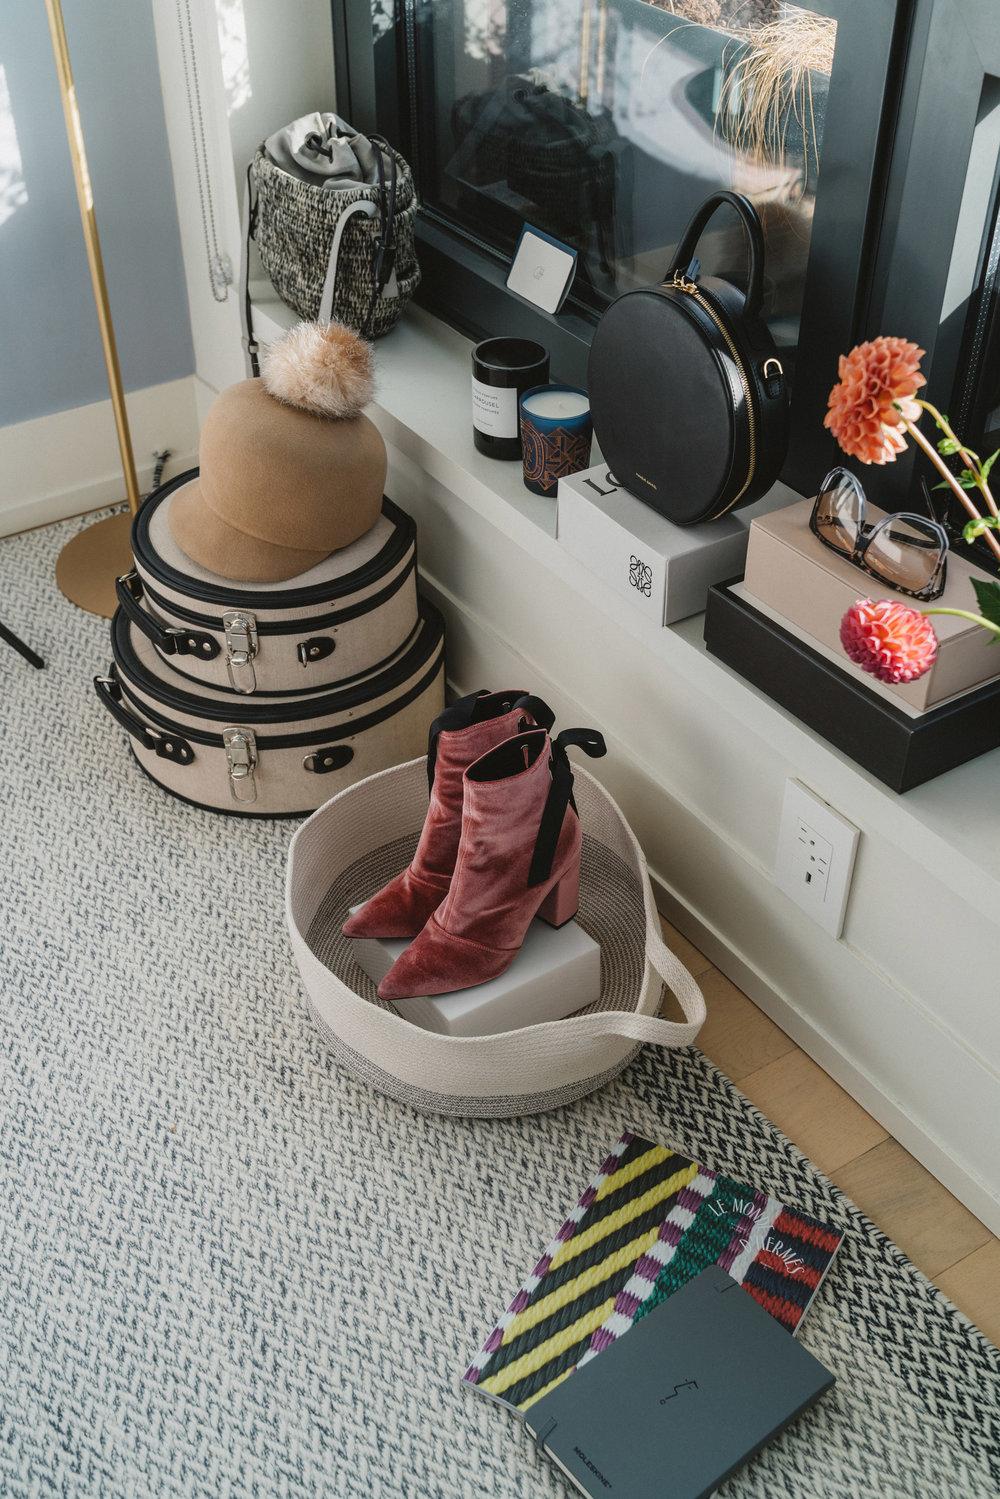 Muuto Rug, Khokho Bag, Lola Hats Hat, Steamline Luggage Hatbox,Byredo Candle, Diptyque Candle, Mansur Gavriel Bag,Robert Clergerie Boots, Jason Wu Moleskin